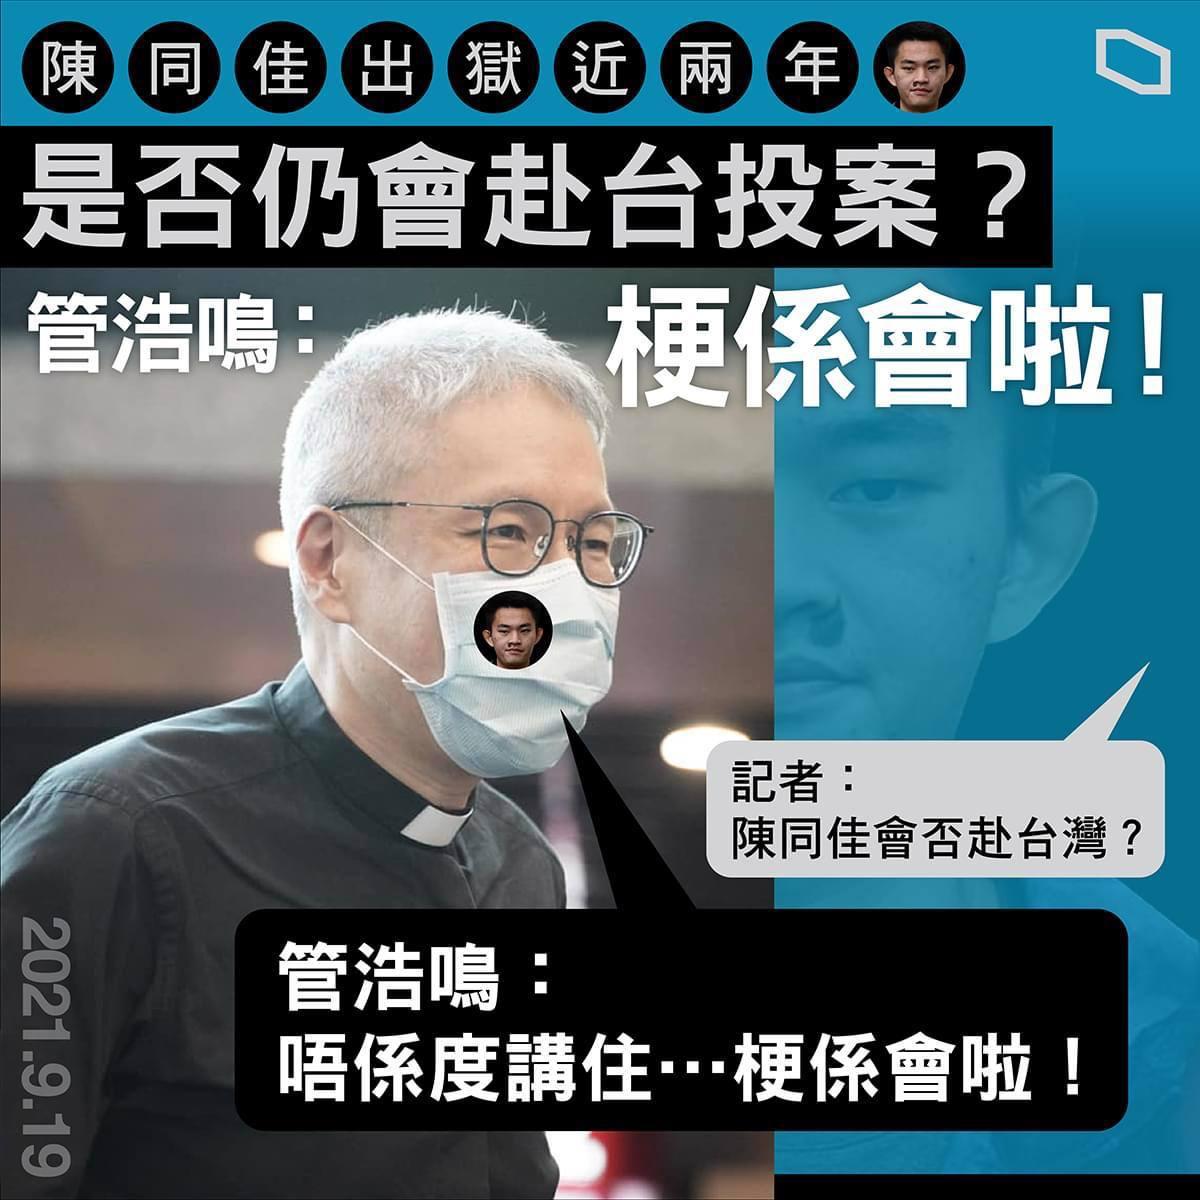 https://upload.hkgolden.media/comment/qep2eum5.113ecfwqvtd.ijvws1asdgg.0km.jpg